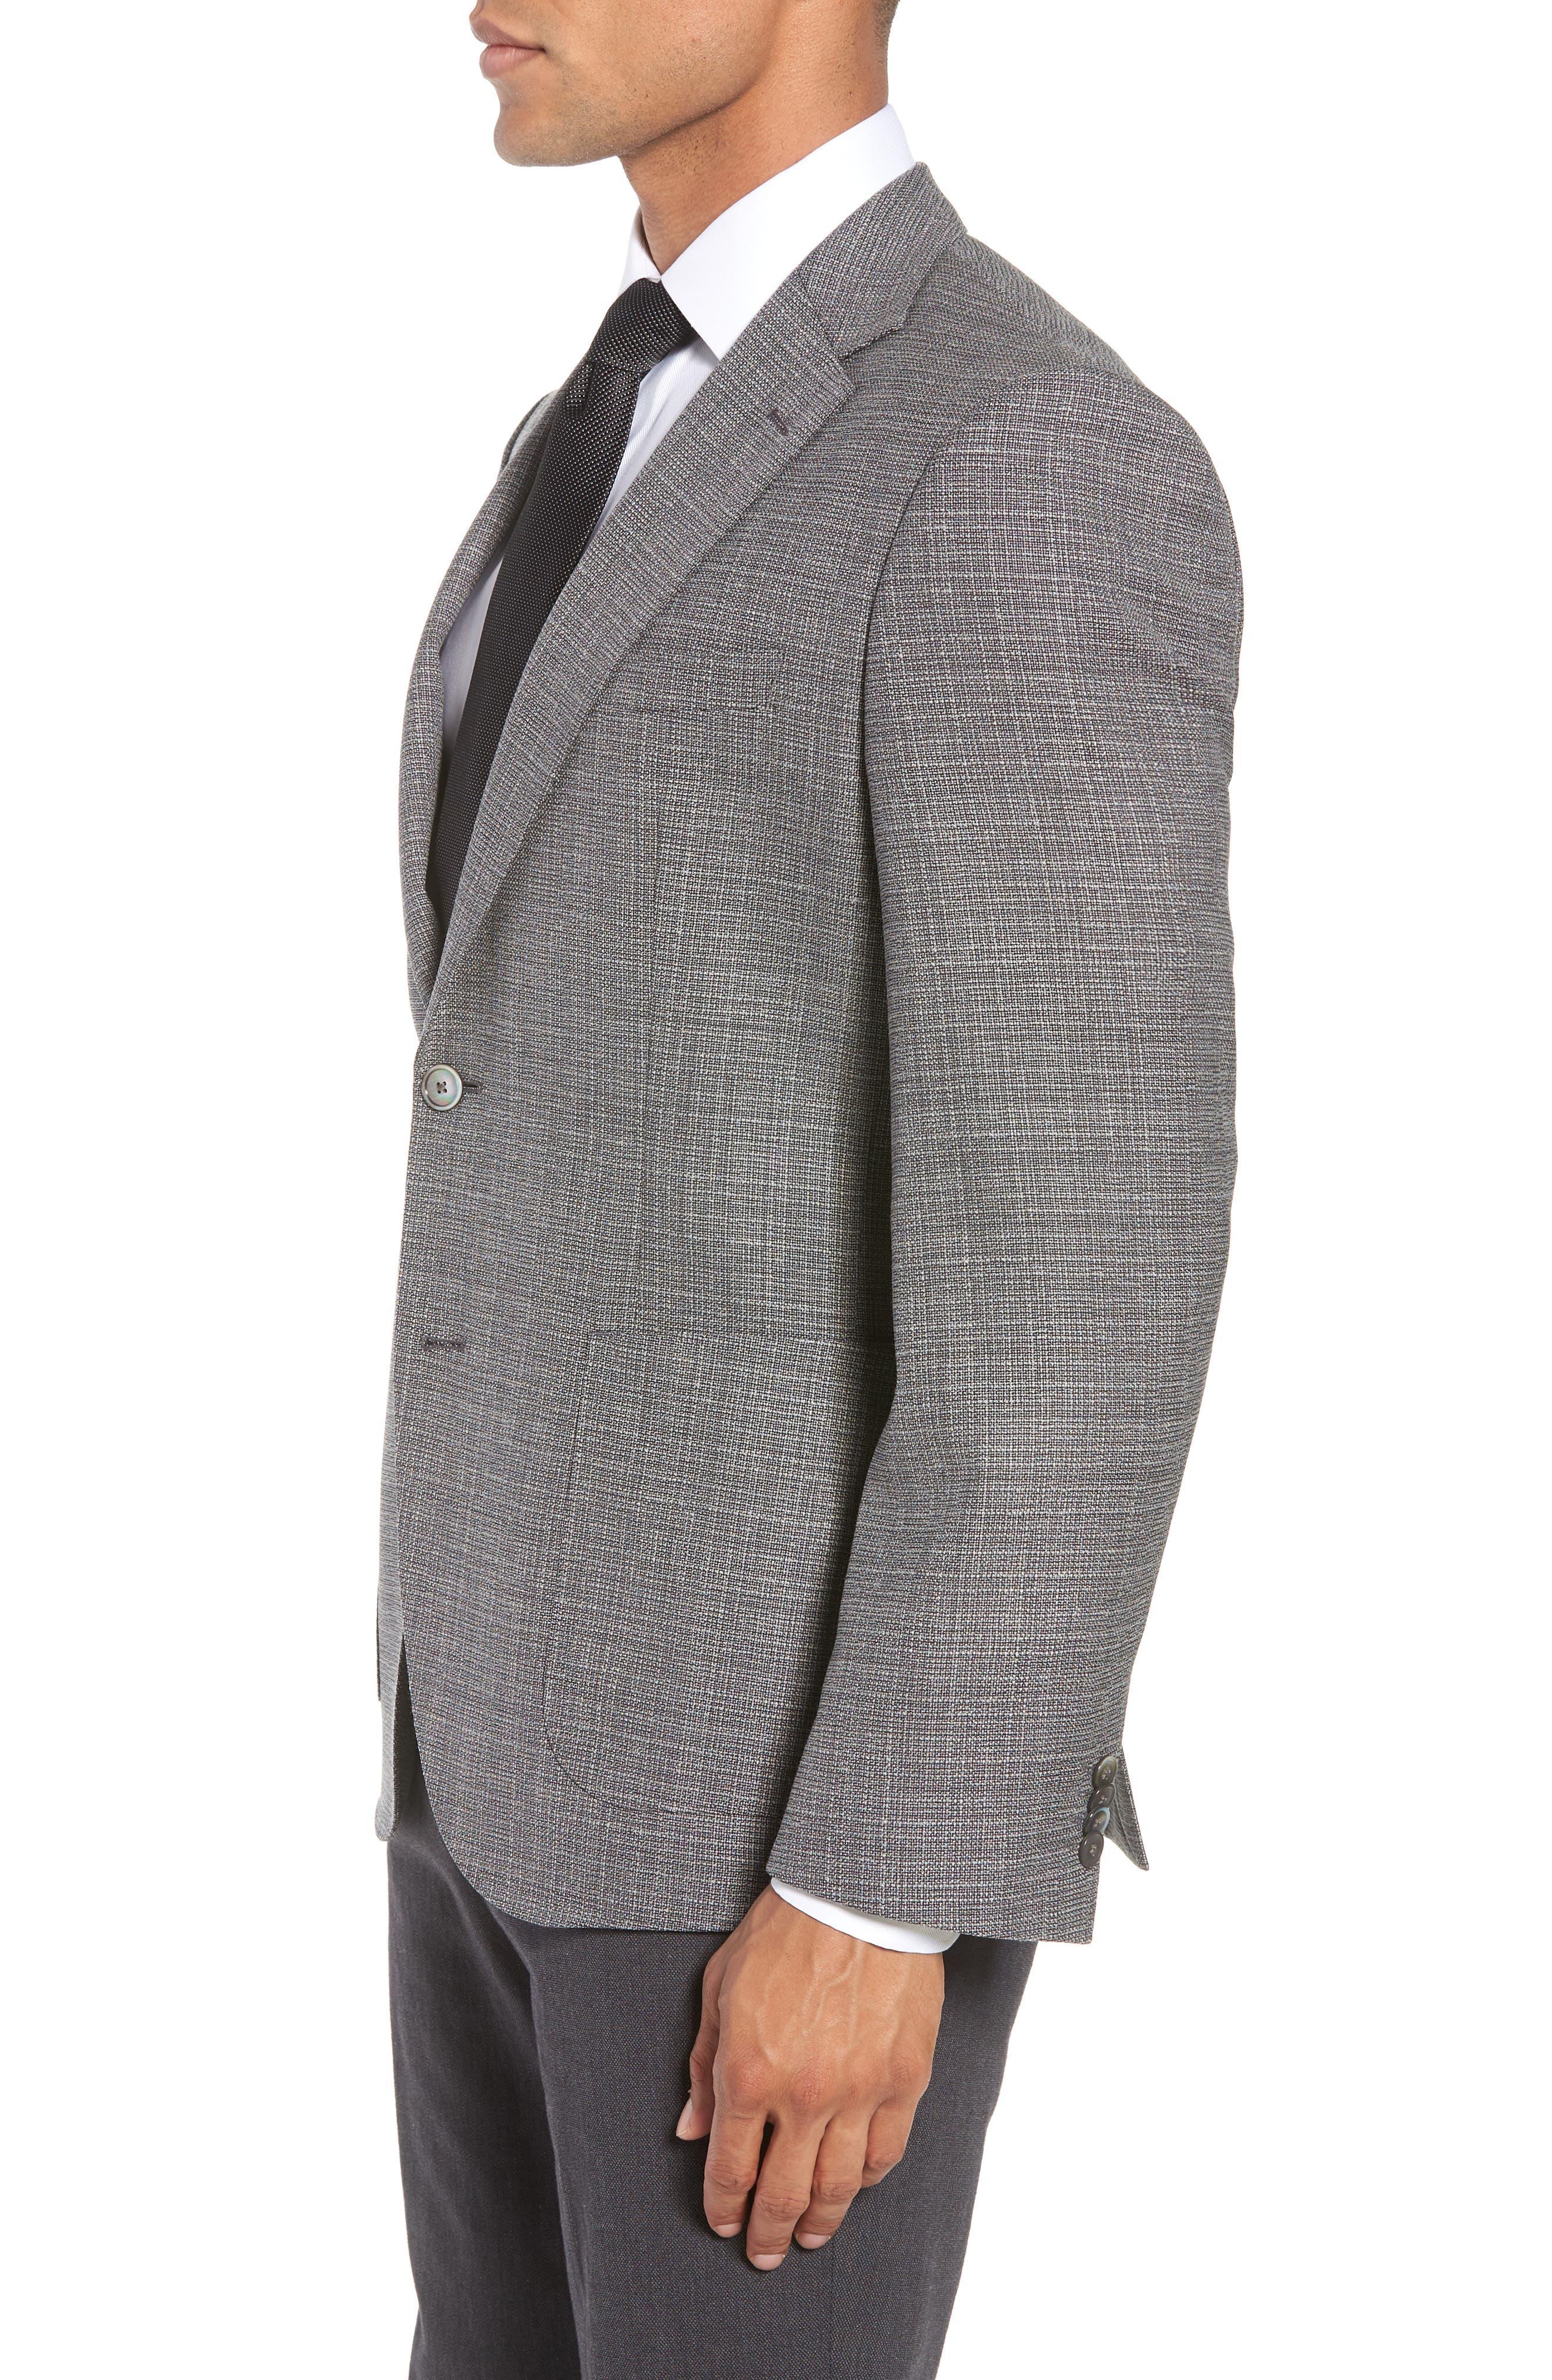 Janson Classic Fit Wool Blazer,                             Alternate thumbnail 3, color,                             GREY